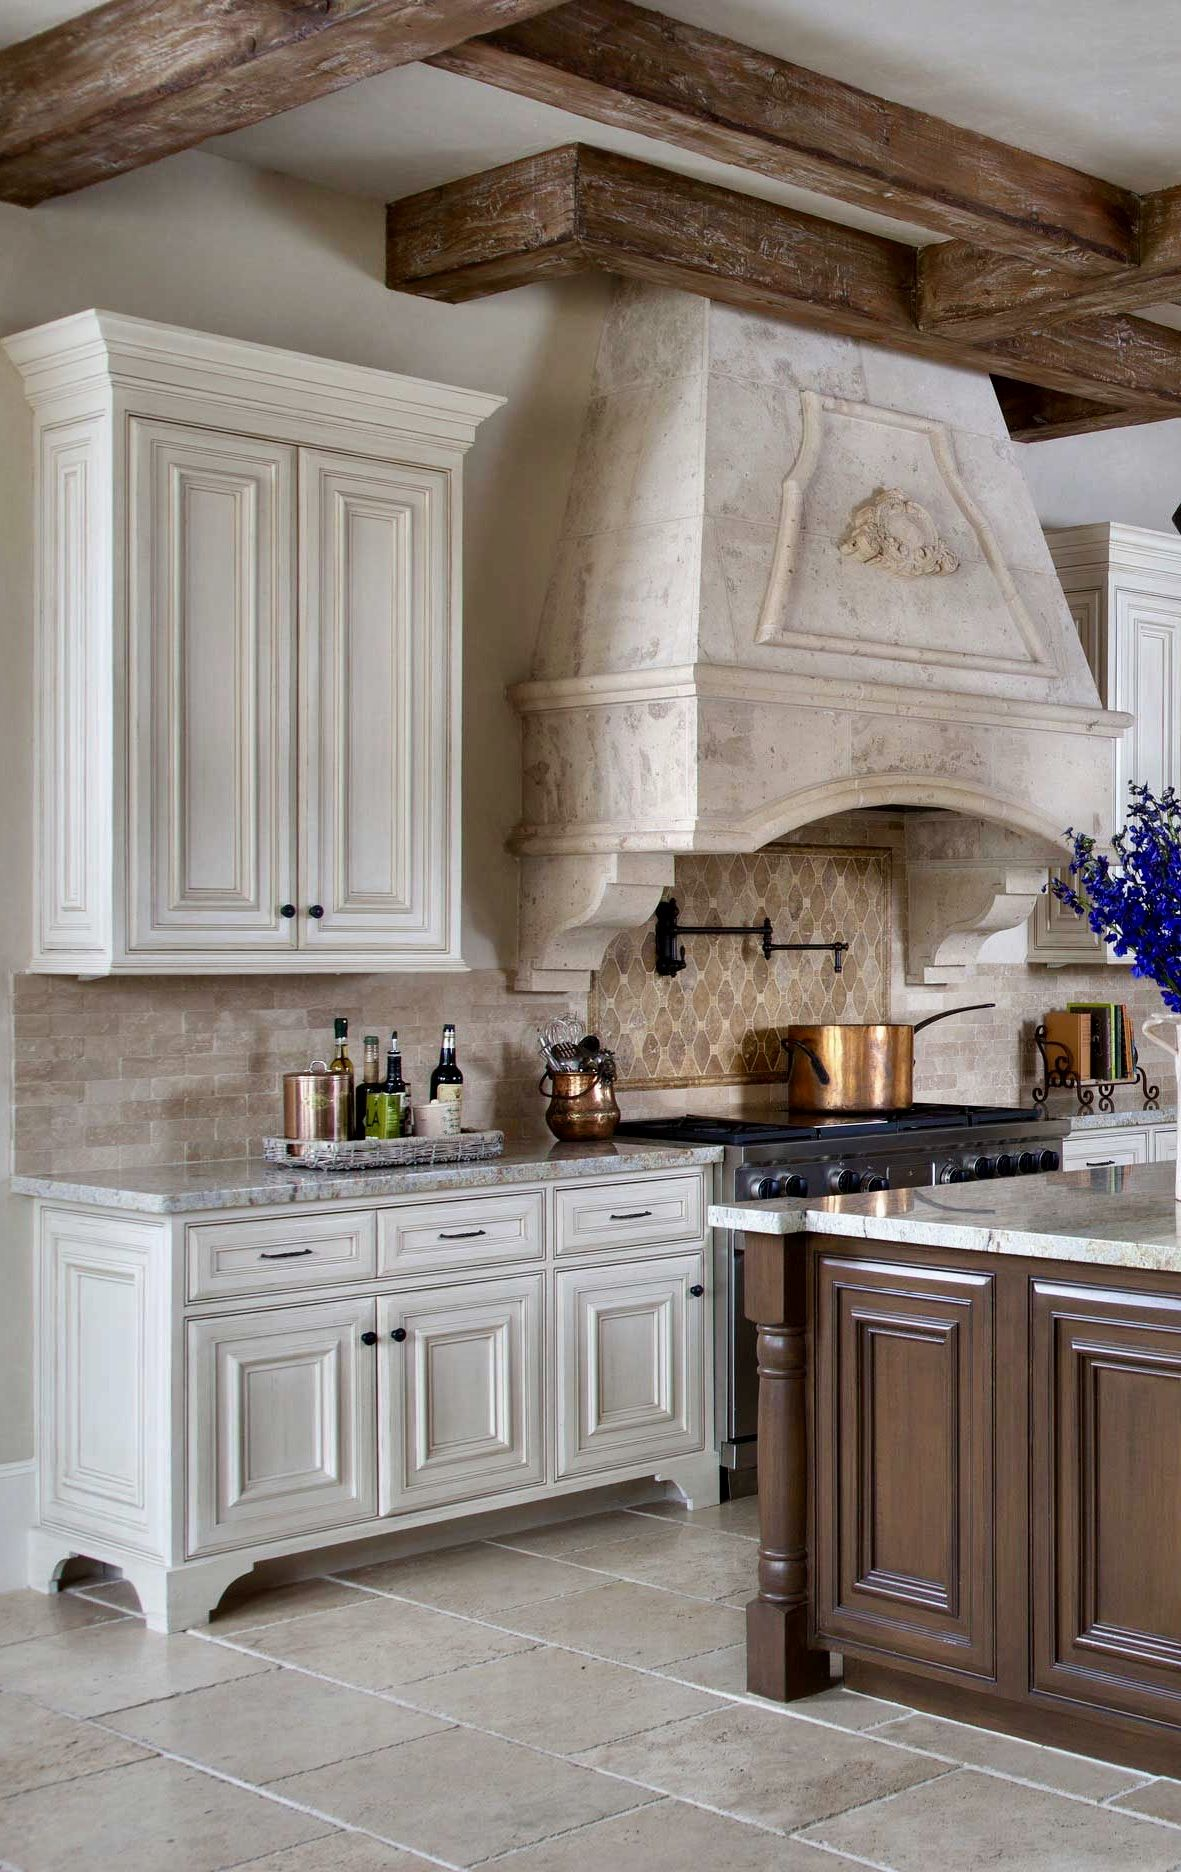 Ideas And Expert Tips On Mediterranean Kitchen Design Mediterranean Kitchen Design Spanish Style Kitchen Mediterranean Kitchen